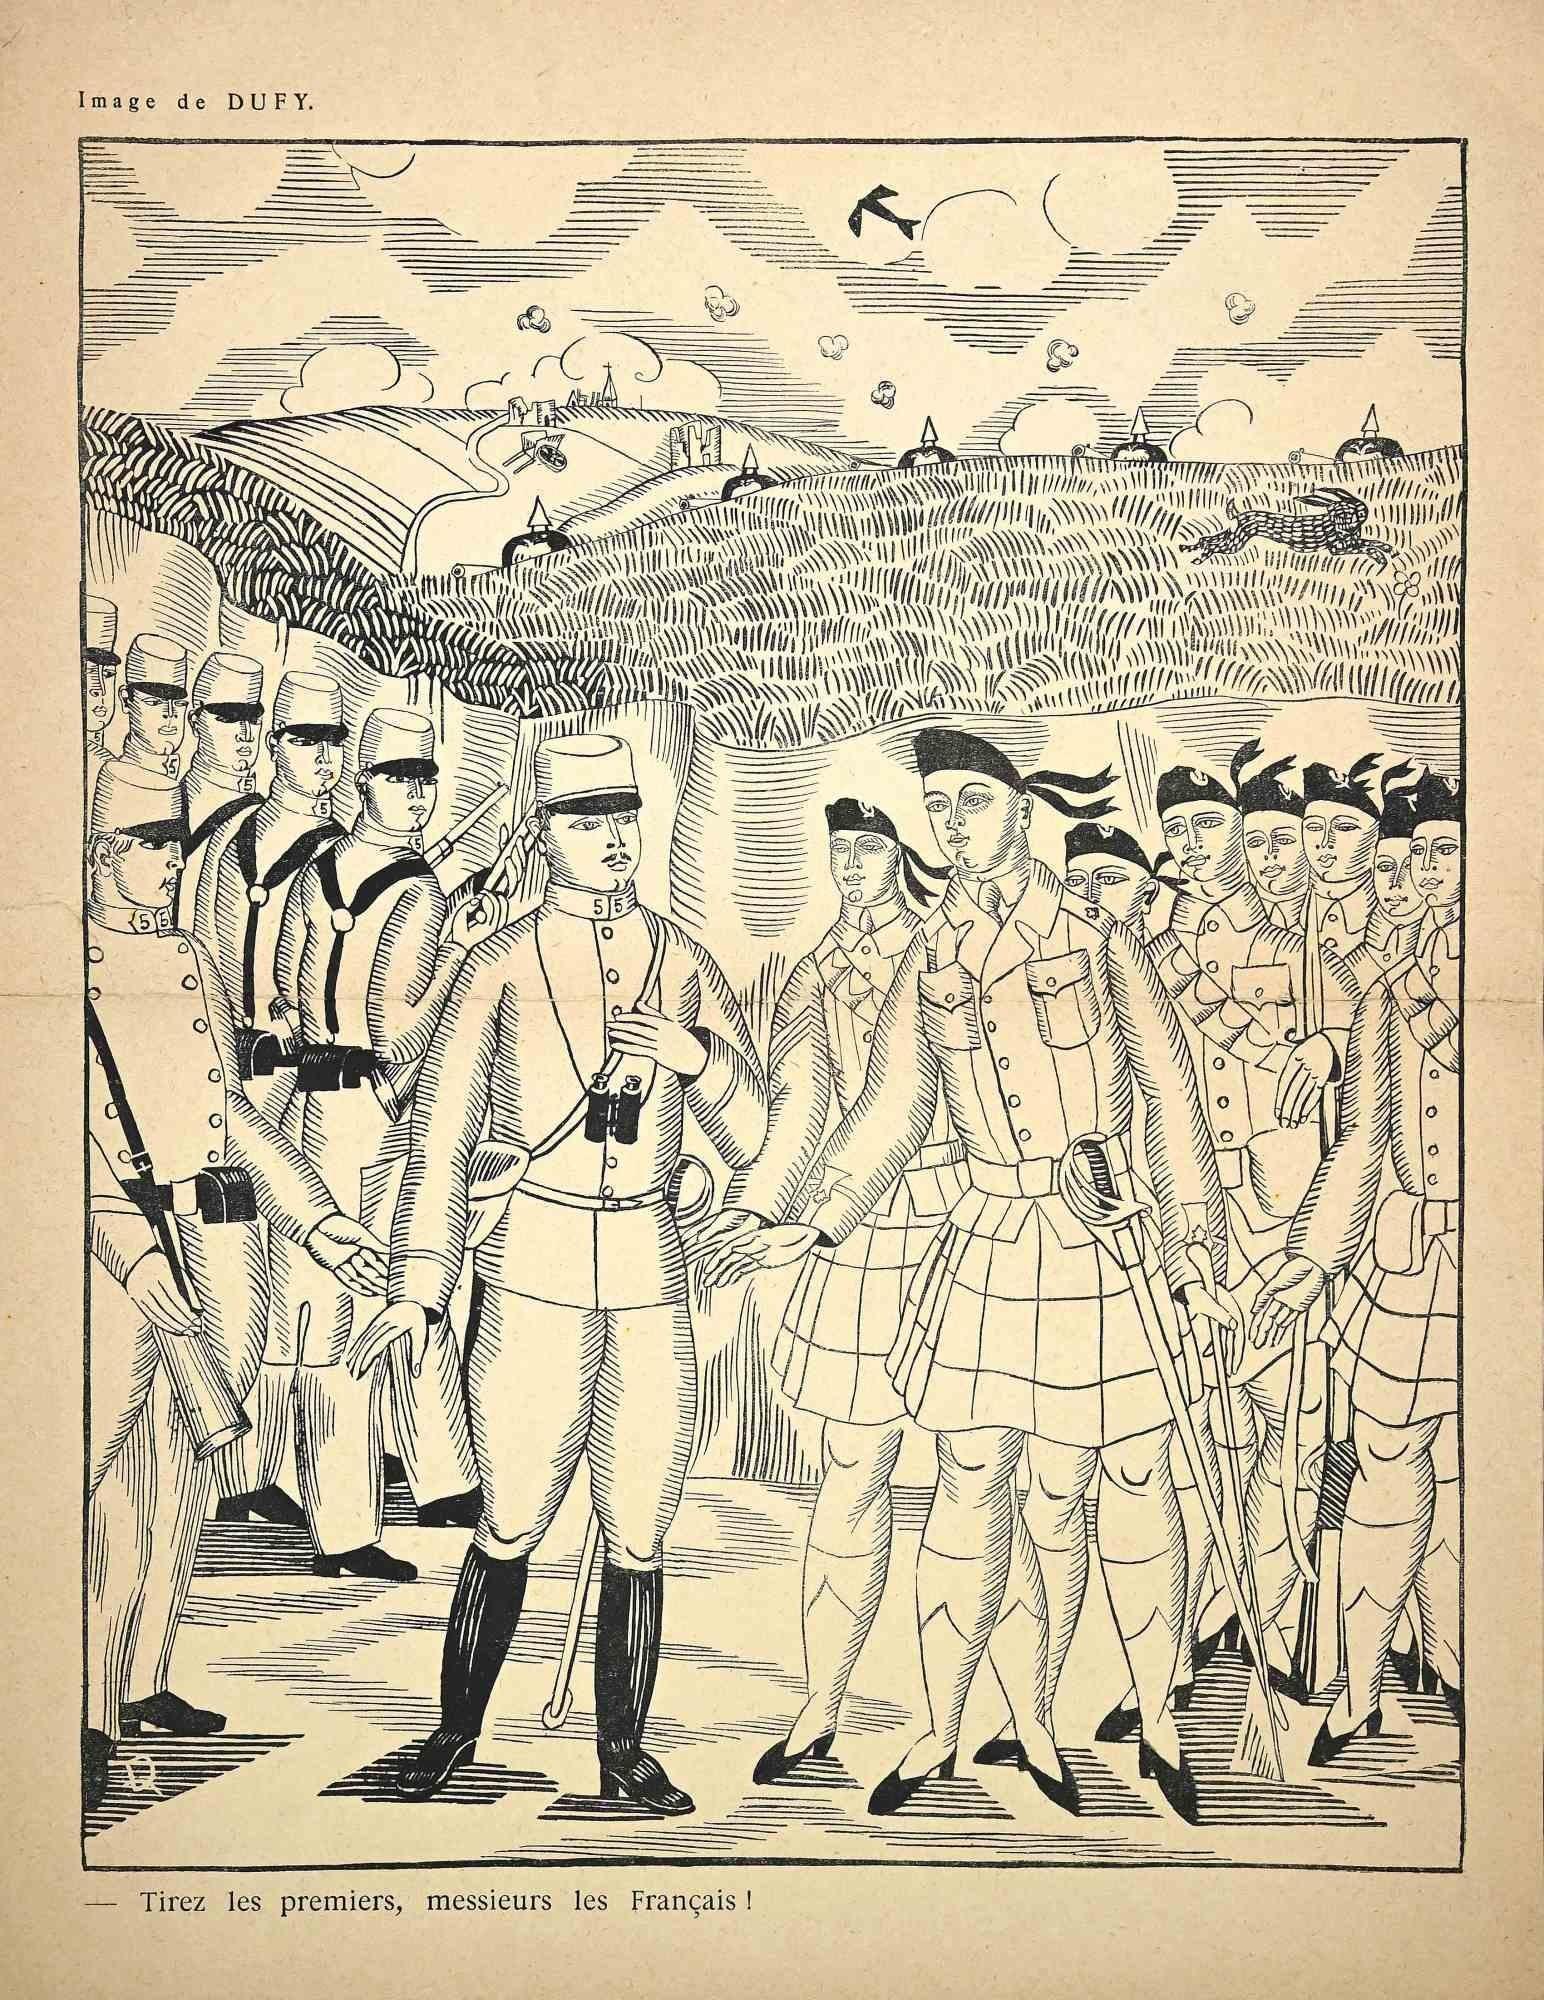 Tirez les Premiers - Original Woodcut Print by Raoul Dufy - Early 20th Century